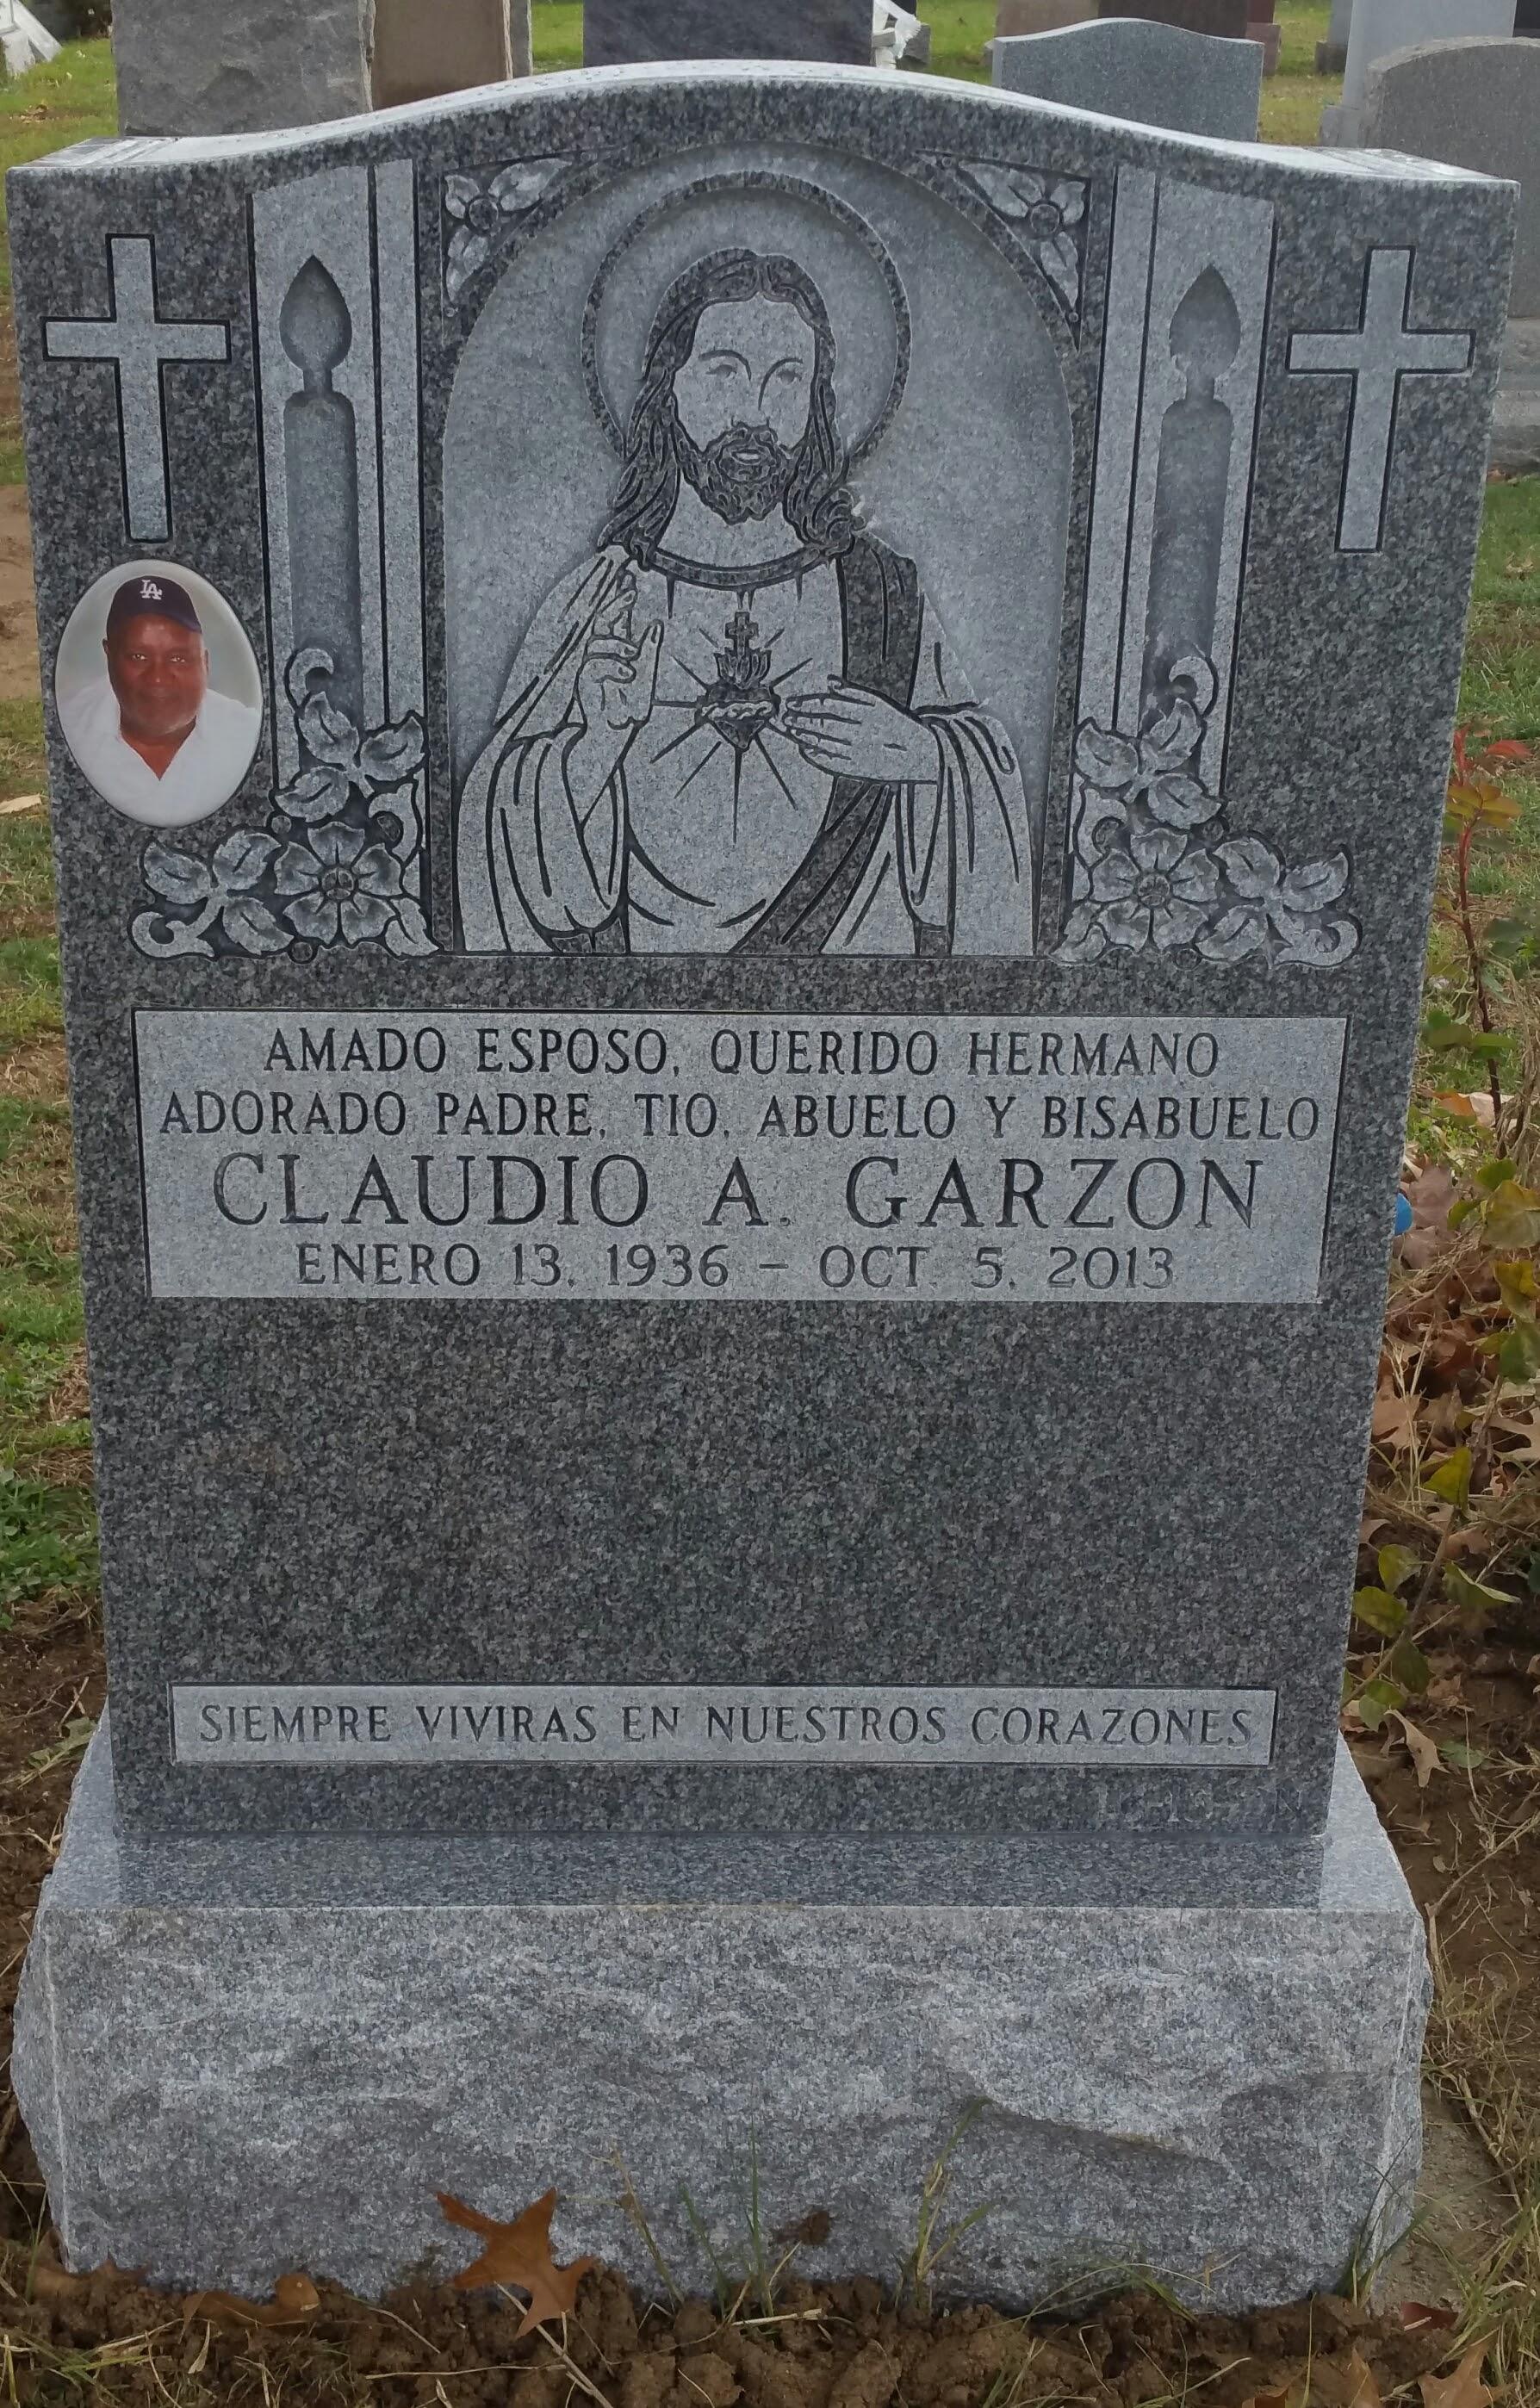 C. Garzon